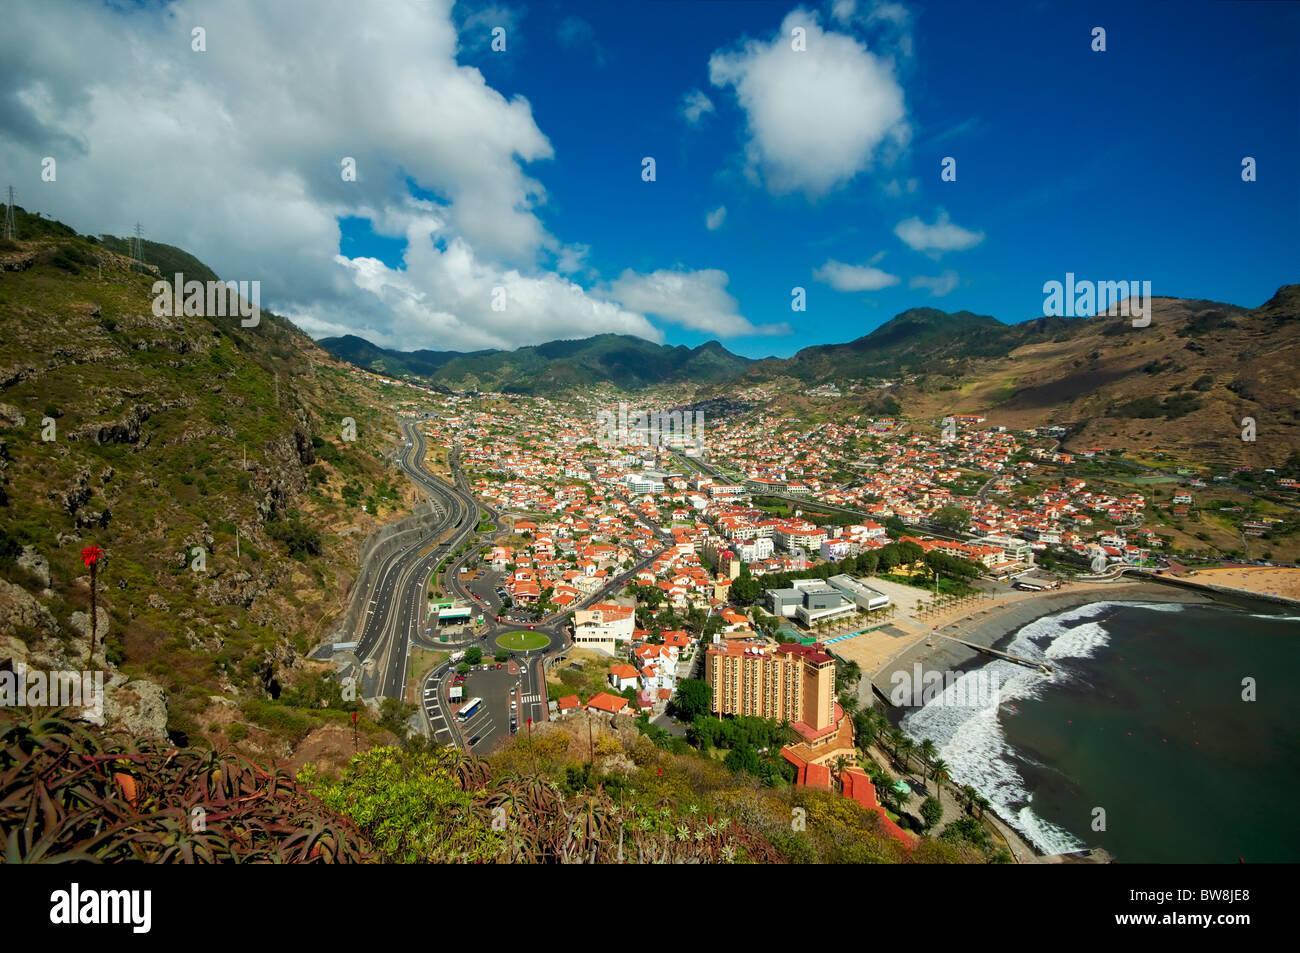 View of Camacha,Madeira - Stock Image